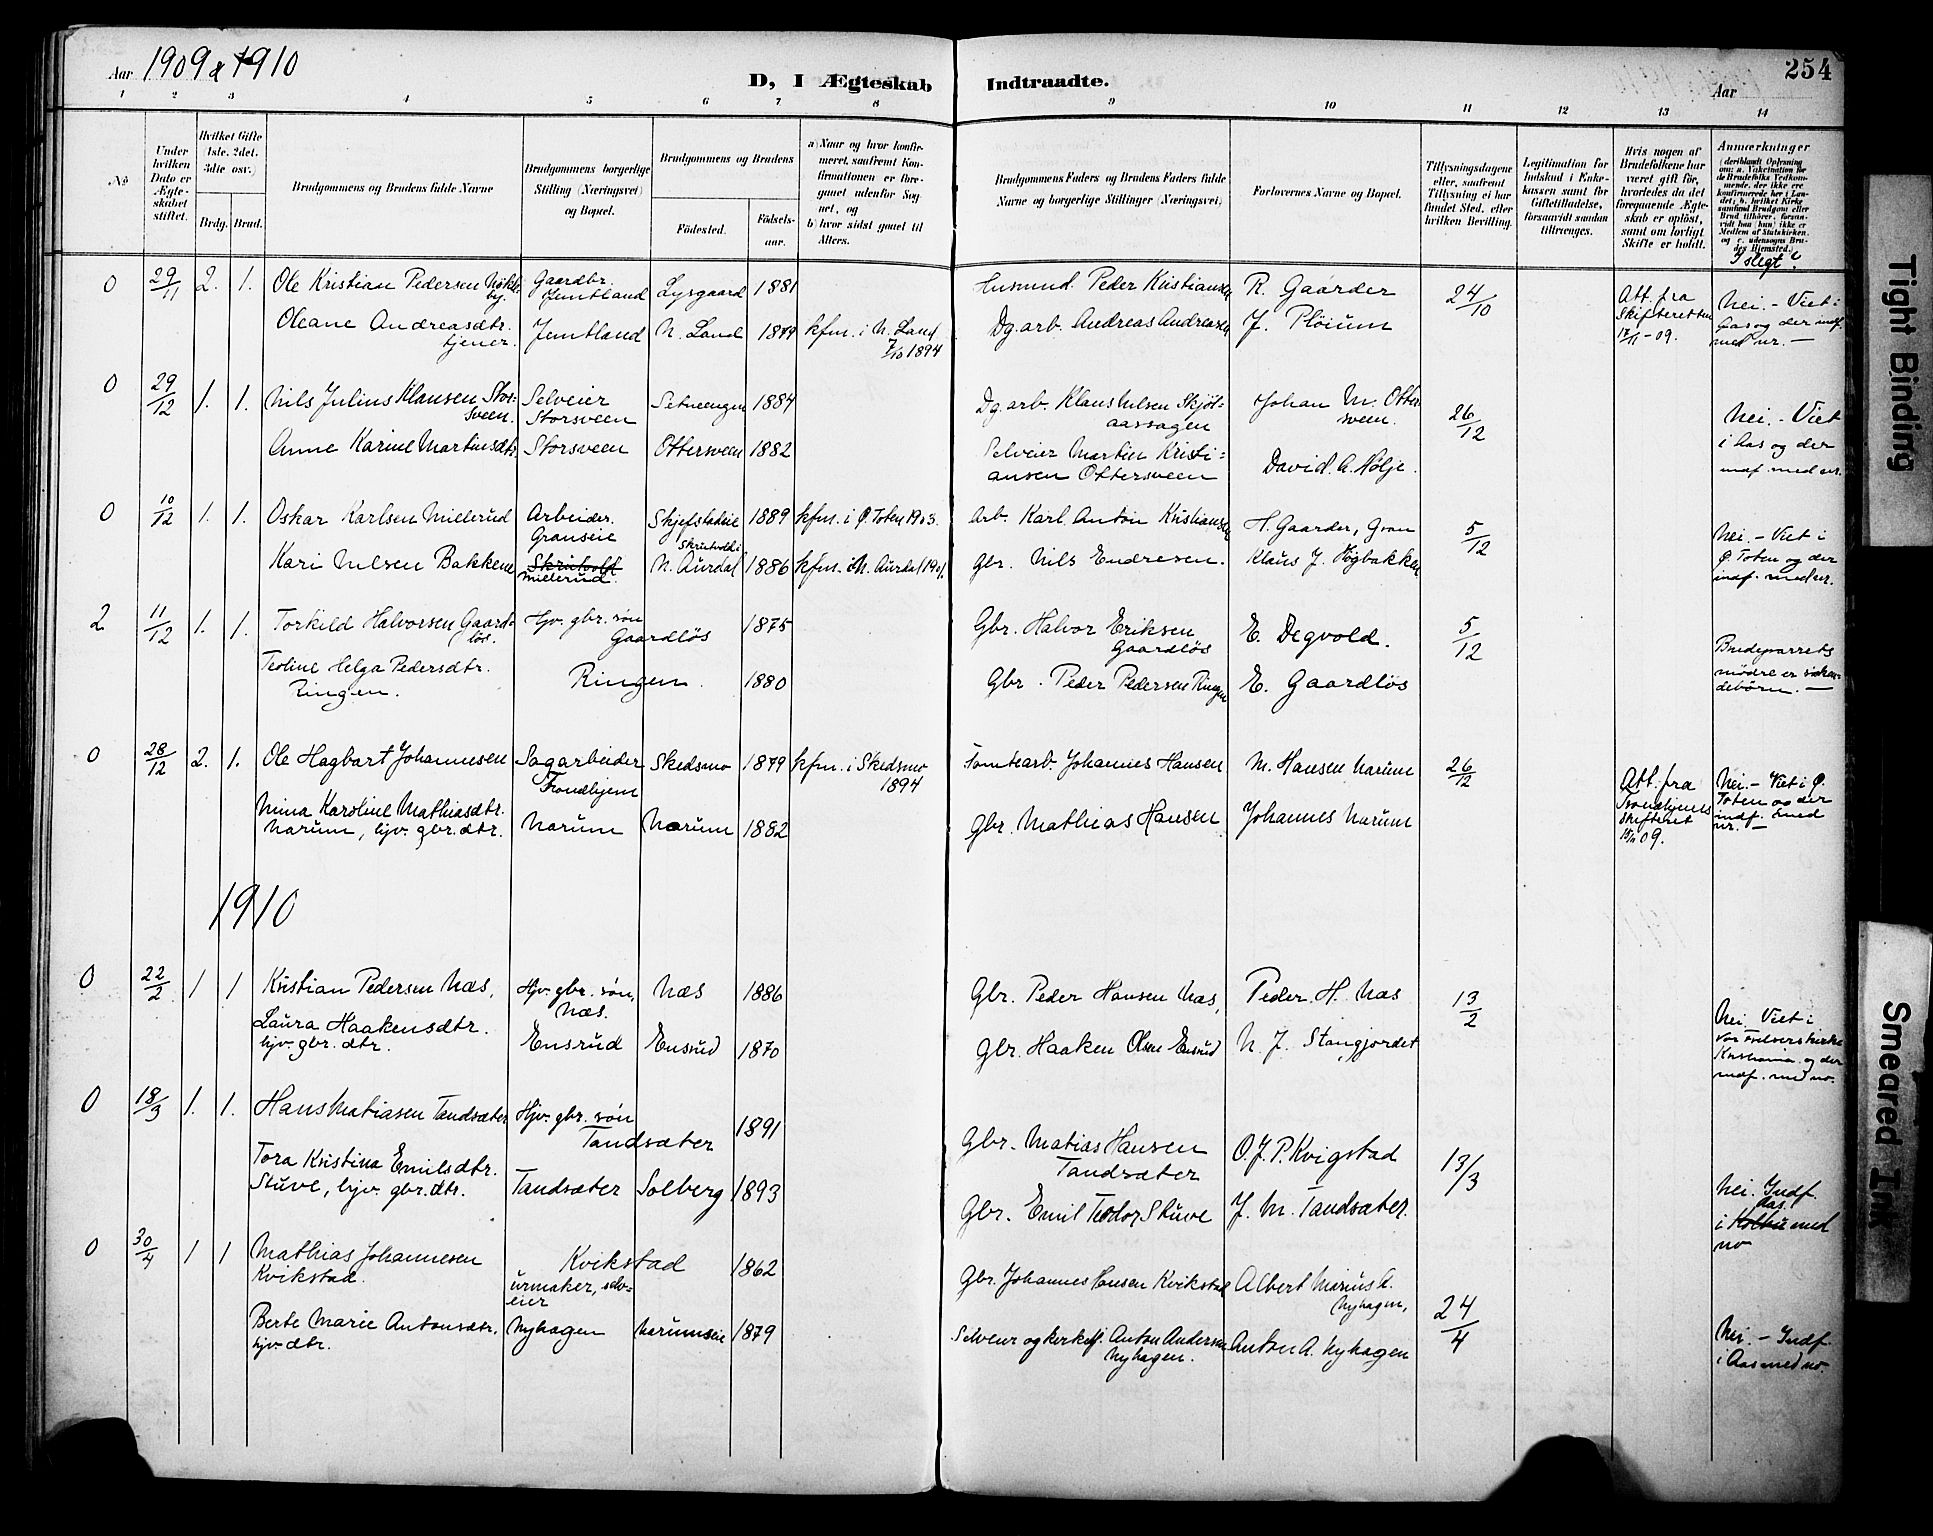 SAH, Vestre Toten prestekontor, H/Ha/Haa/L0013: Ministerialbok nr. 13, 1895-1911, s. 254